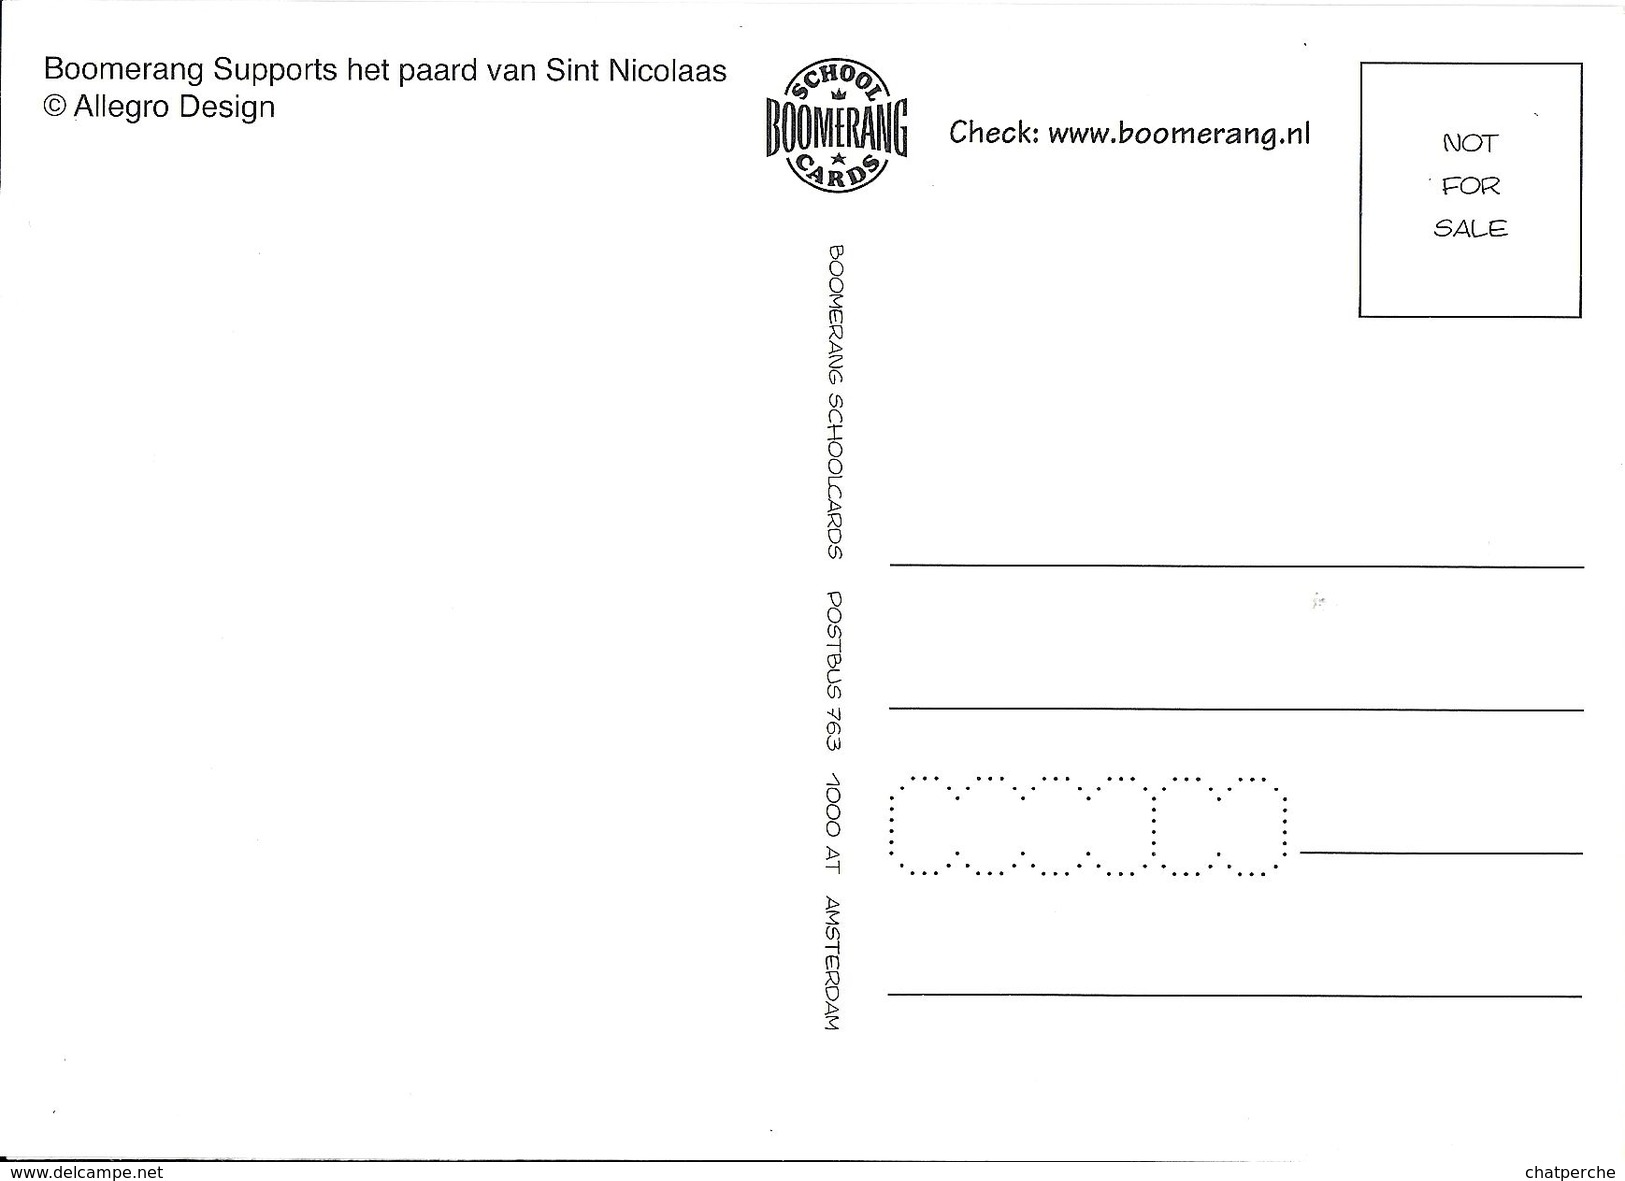 LOGO FERRARI ?? SCHIMMEL CHEVAL  EDIT. BOOMERANG NL - Cartes Postales